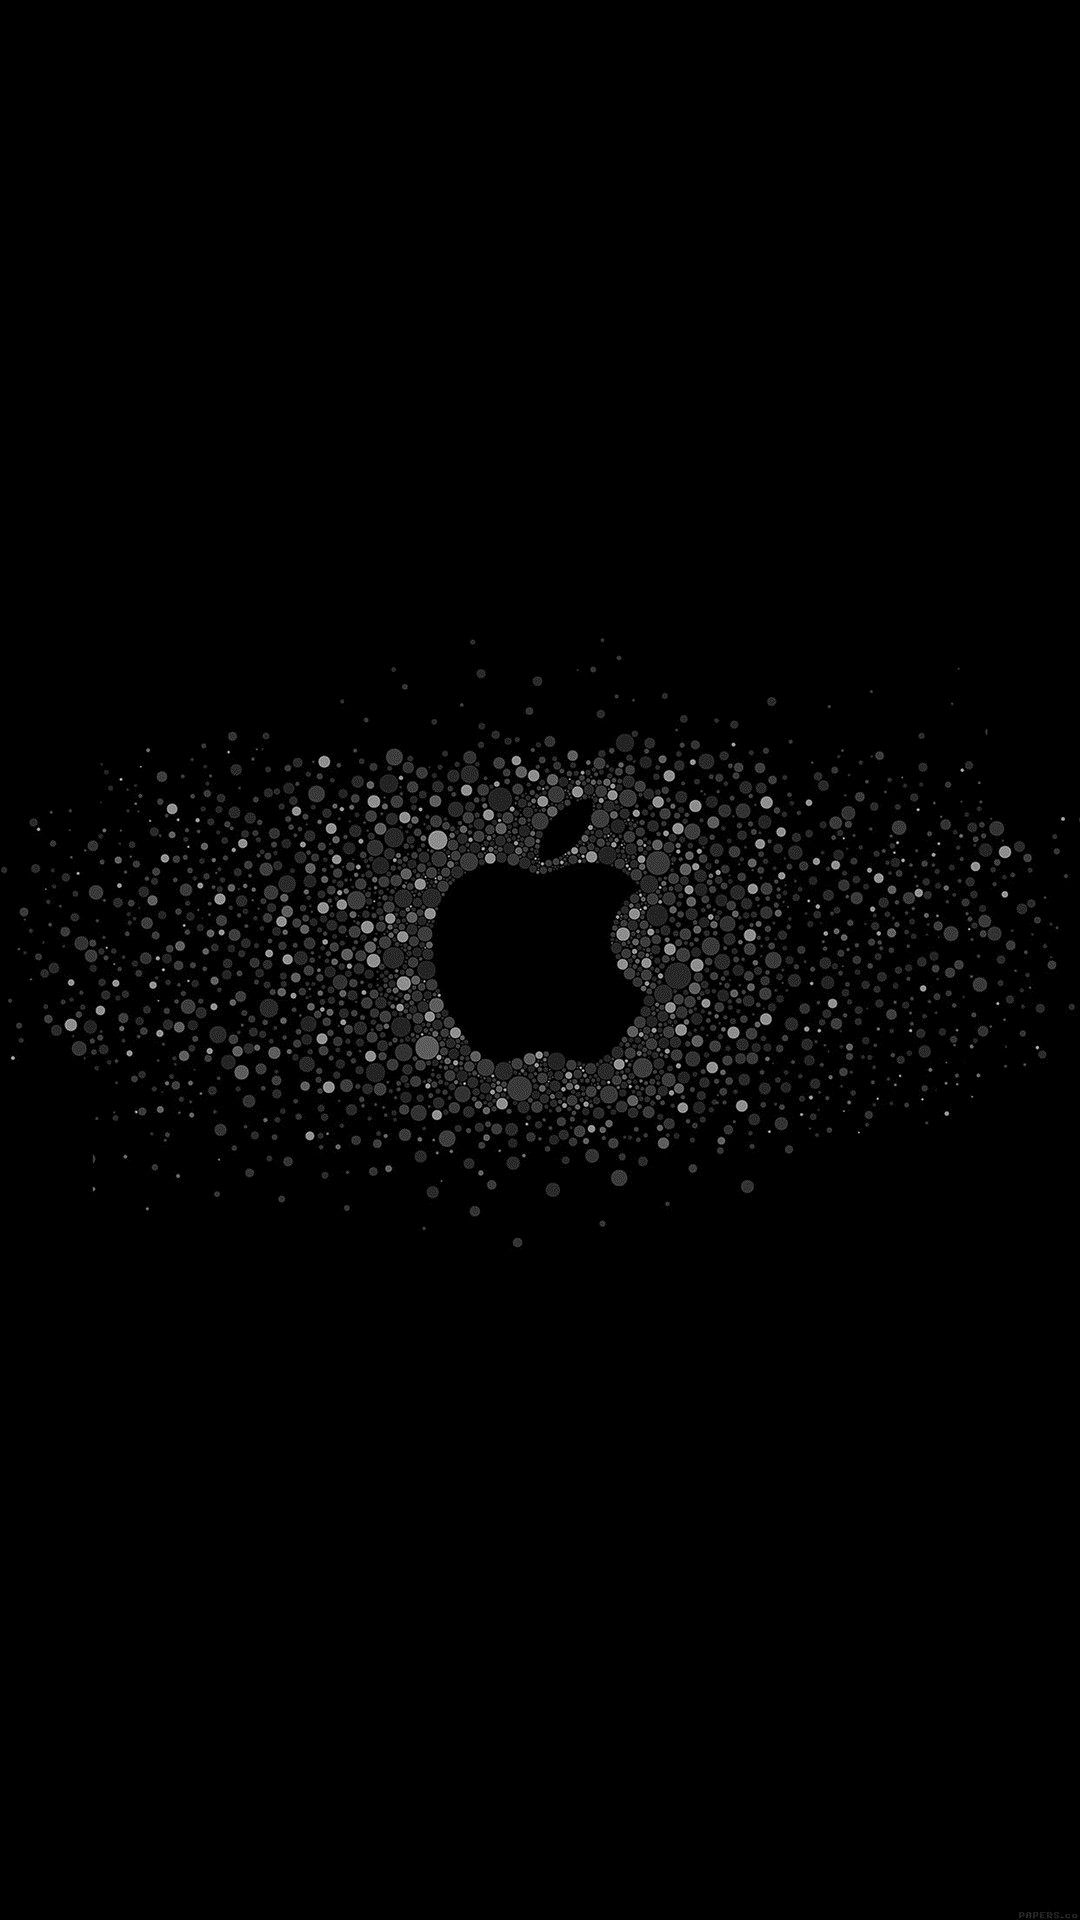 Dark iphone 8 plus wallpaper